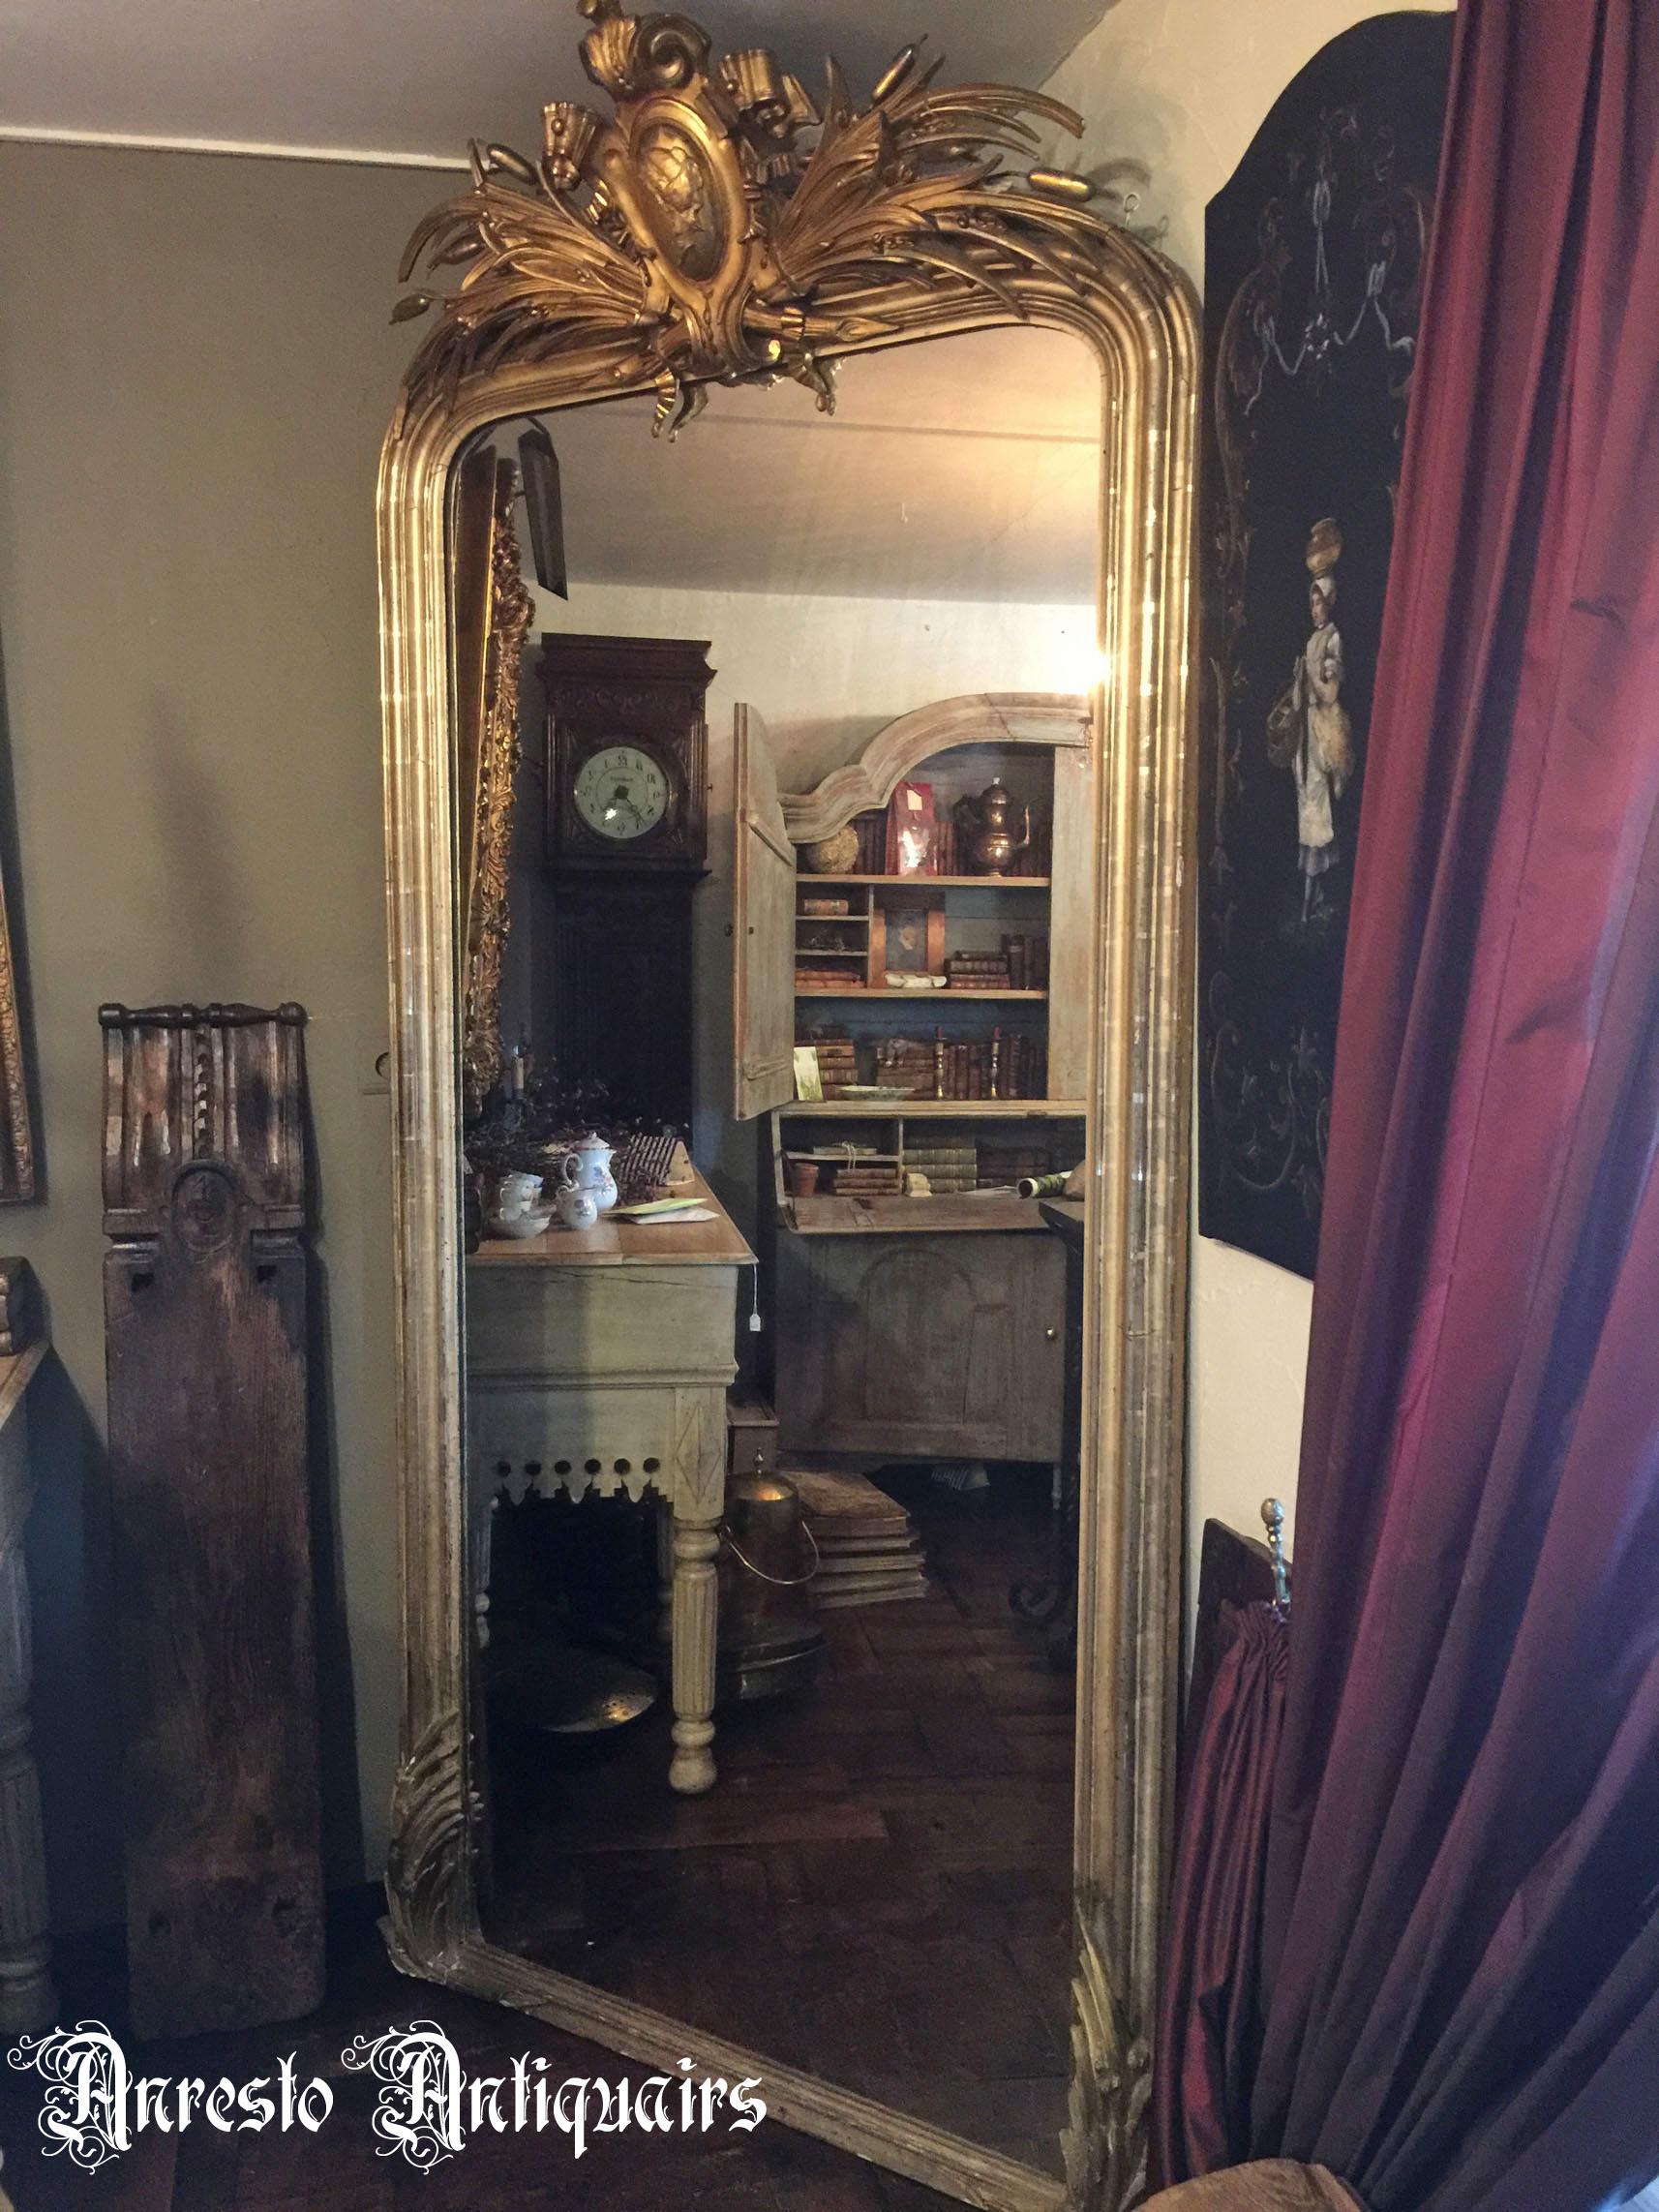 Ref. 34 – Antieke bladgouden spiegel, oude bladgouden halspiegel